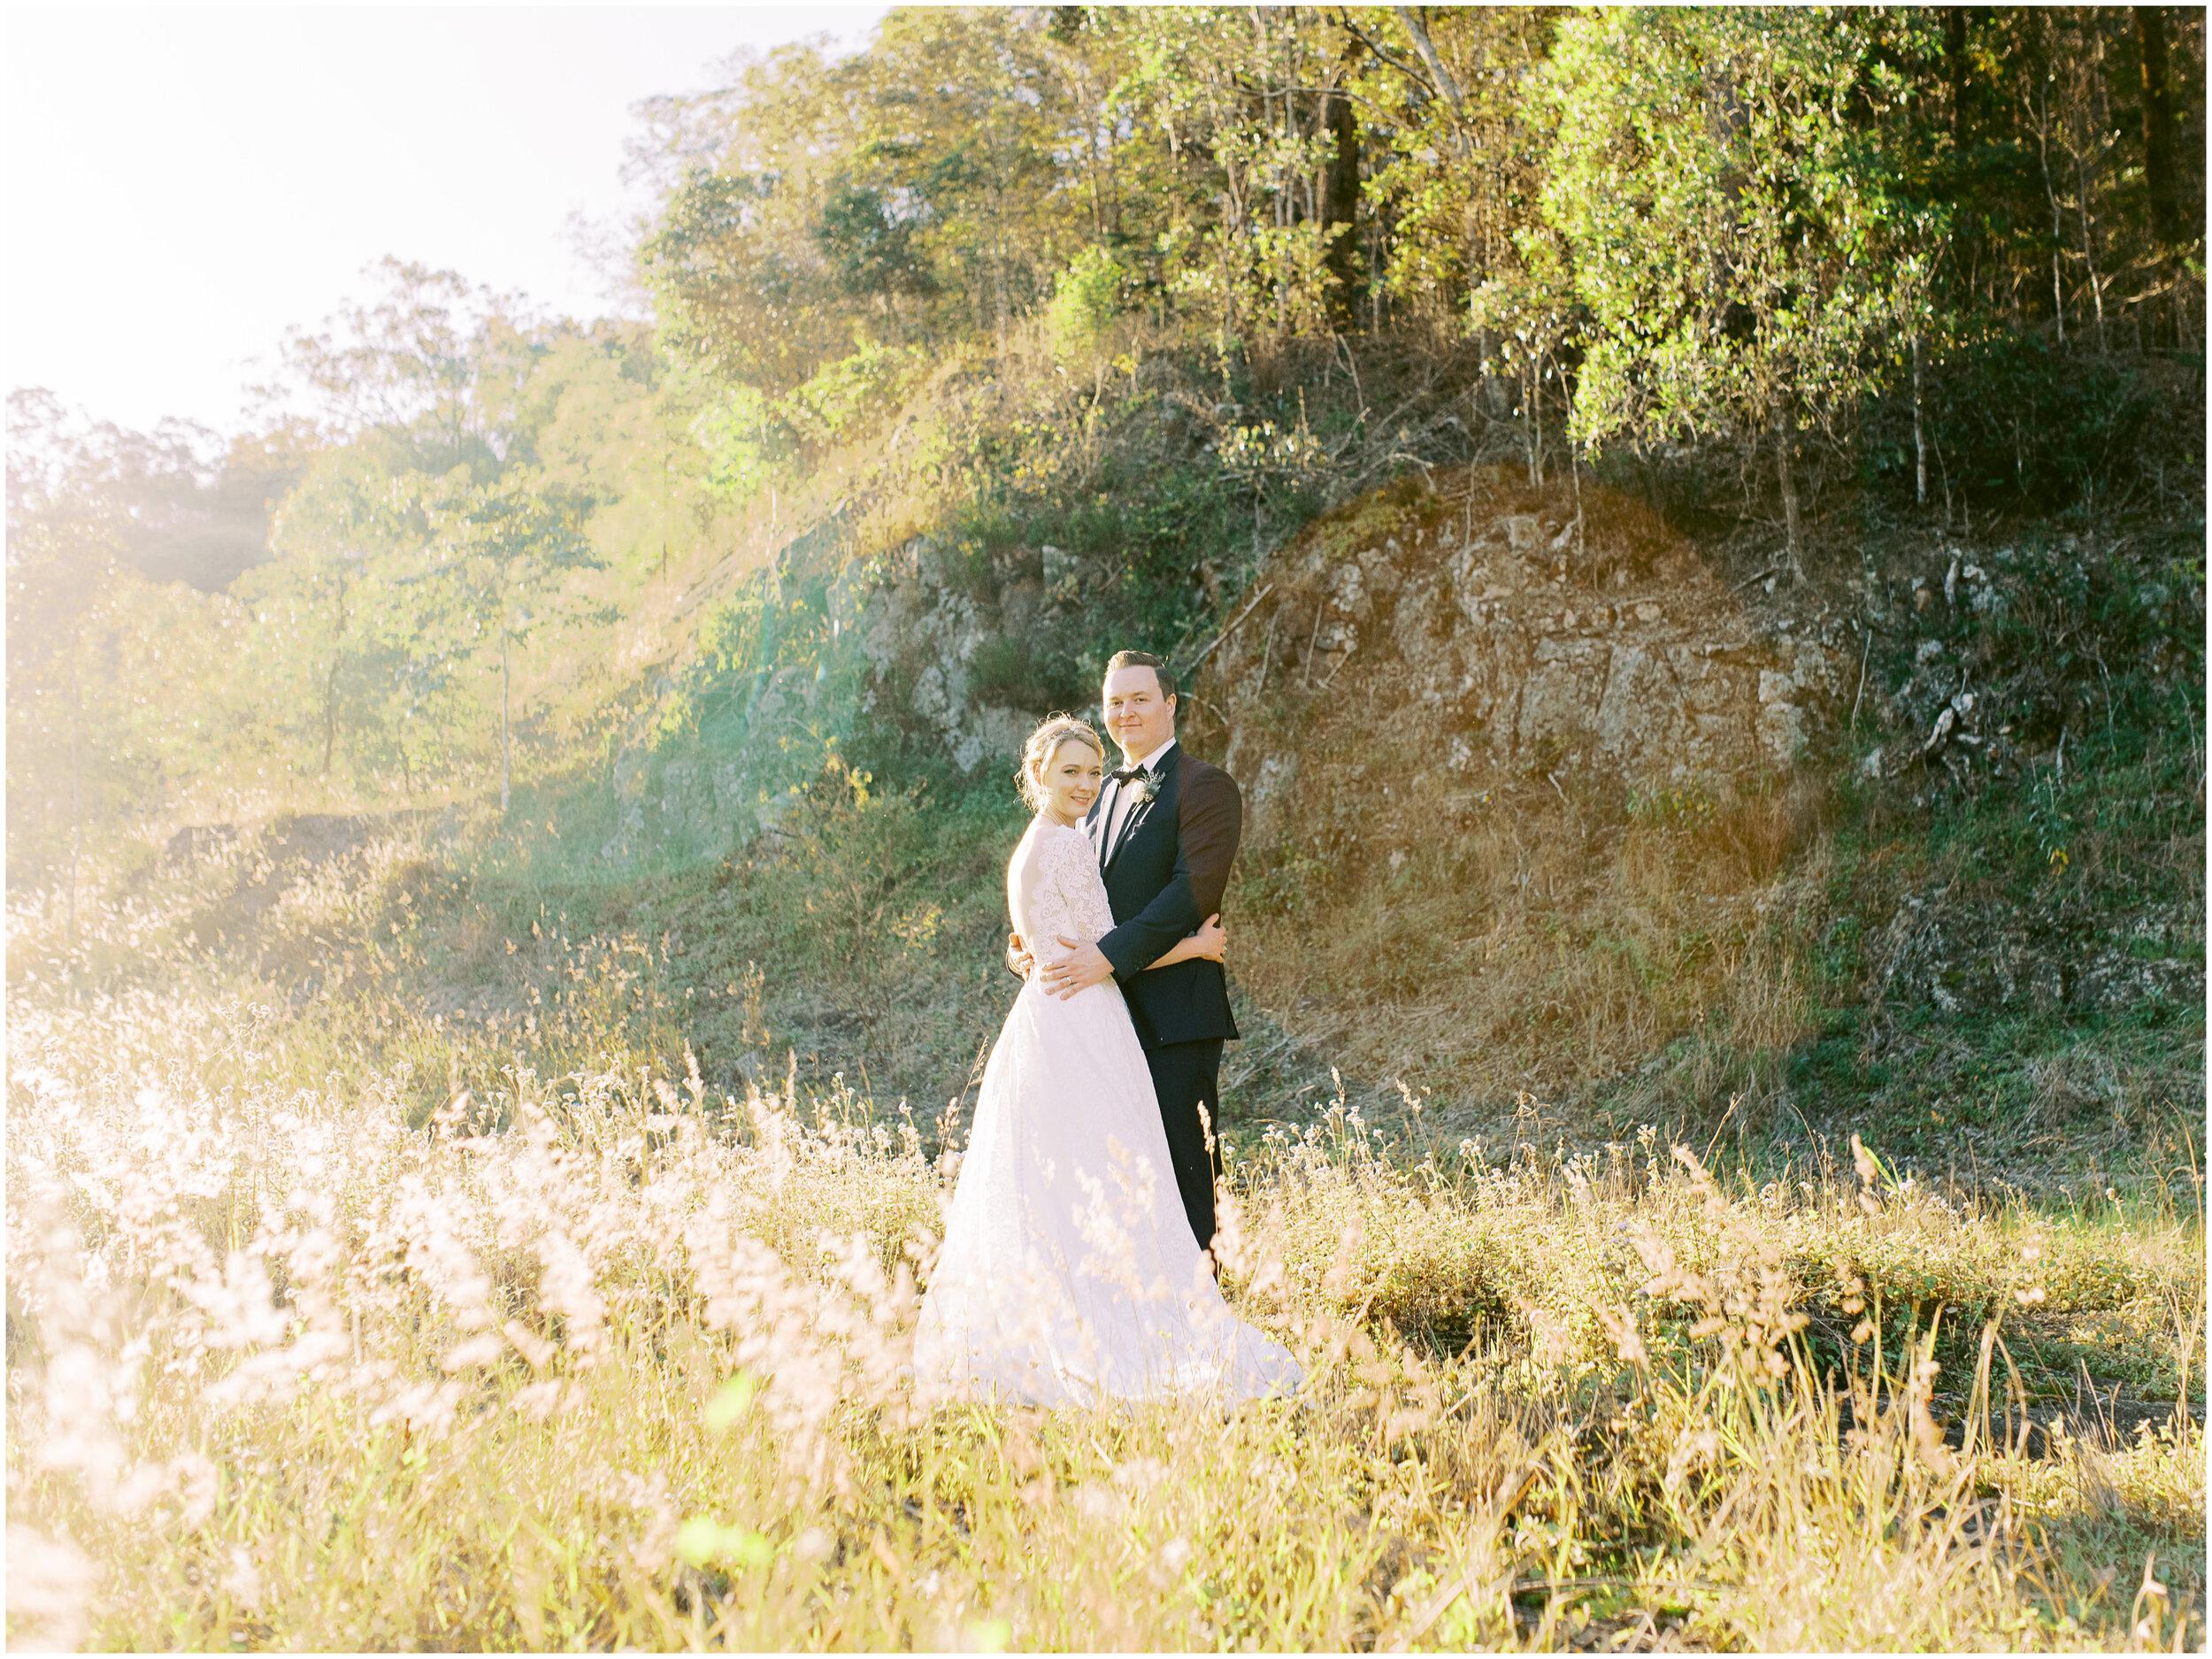 brisbane-film-wedding-photographer-lauren-olivia-luxury-wedding-australia-01-20.jpg